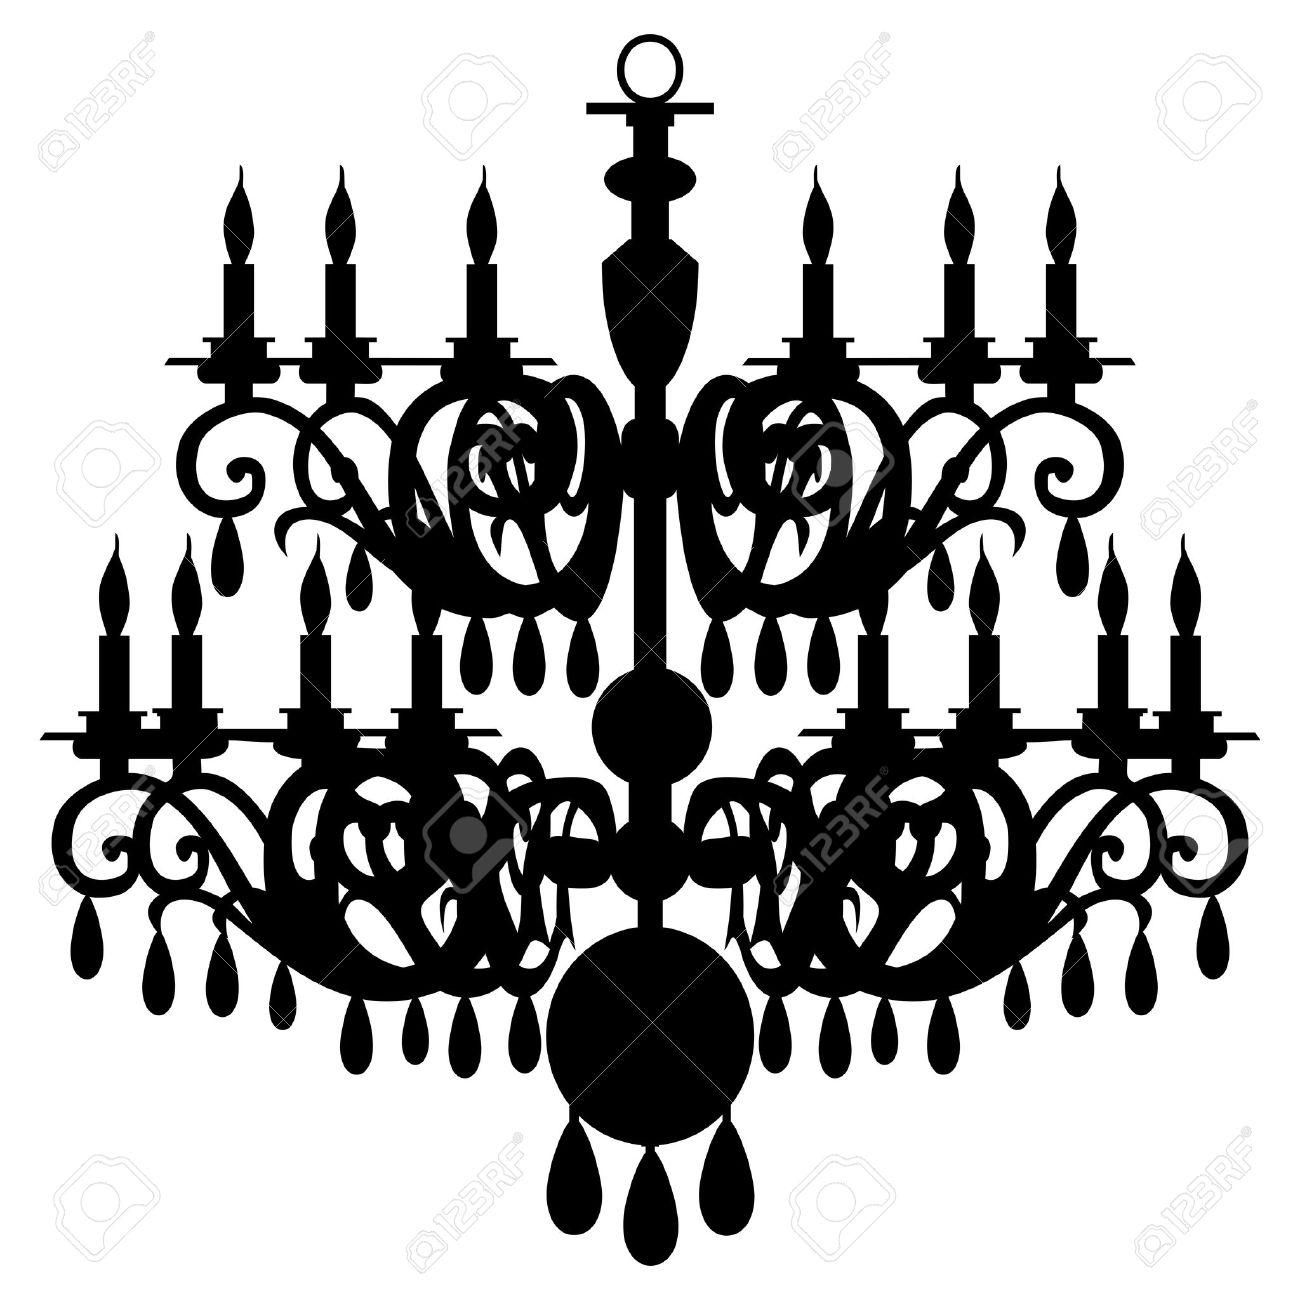 chandelier silhouette - 6047310